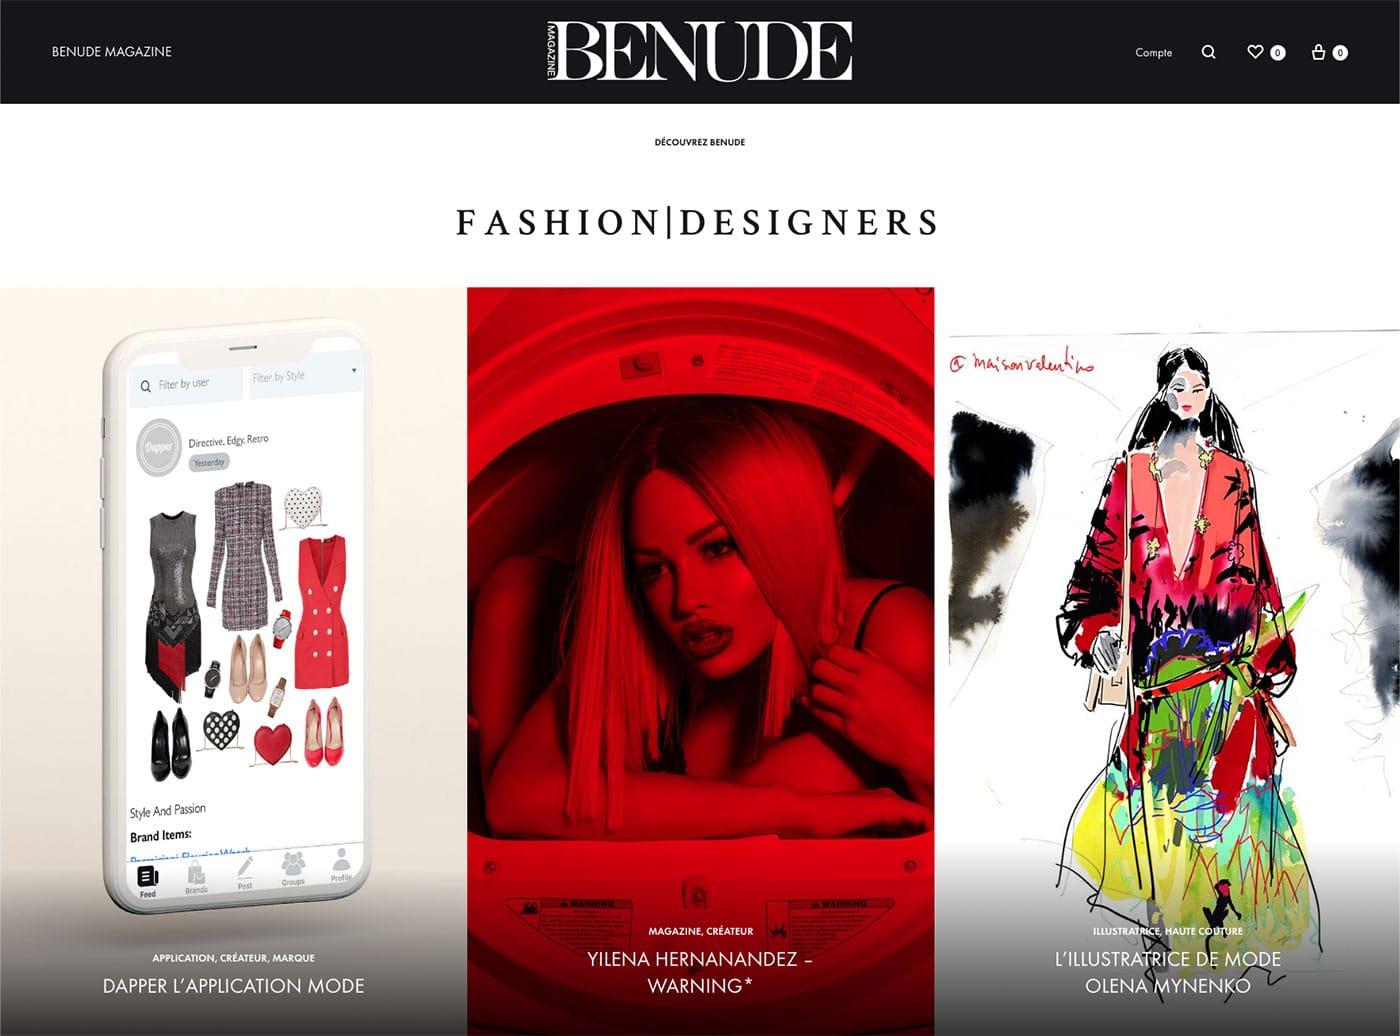 BENUDE magazine cover Dapper application Yilena Hernandez Olena Mynenko